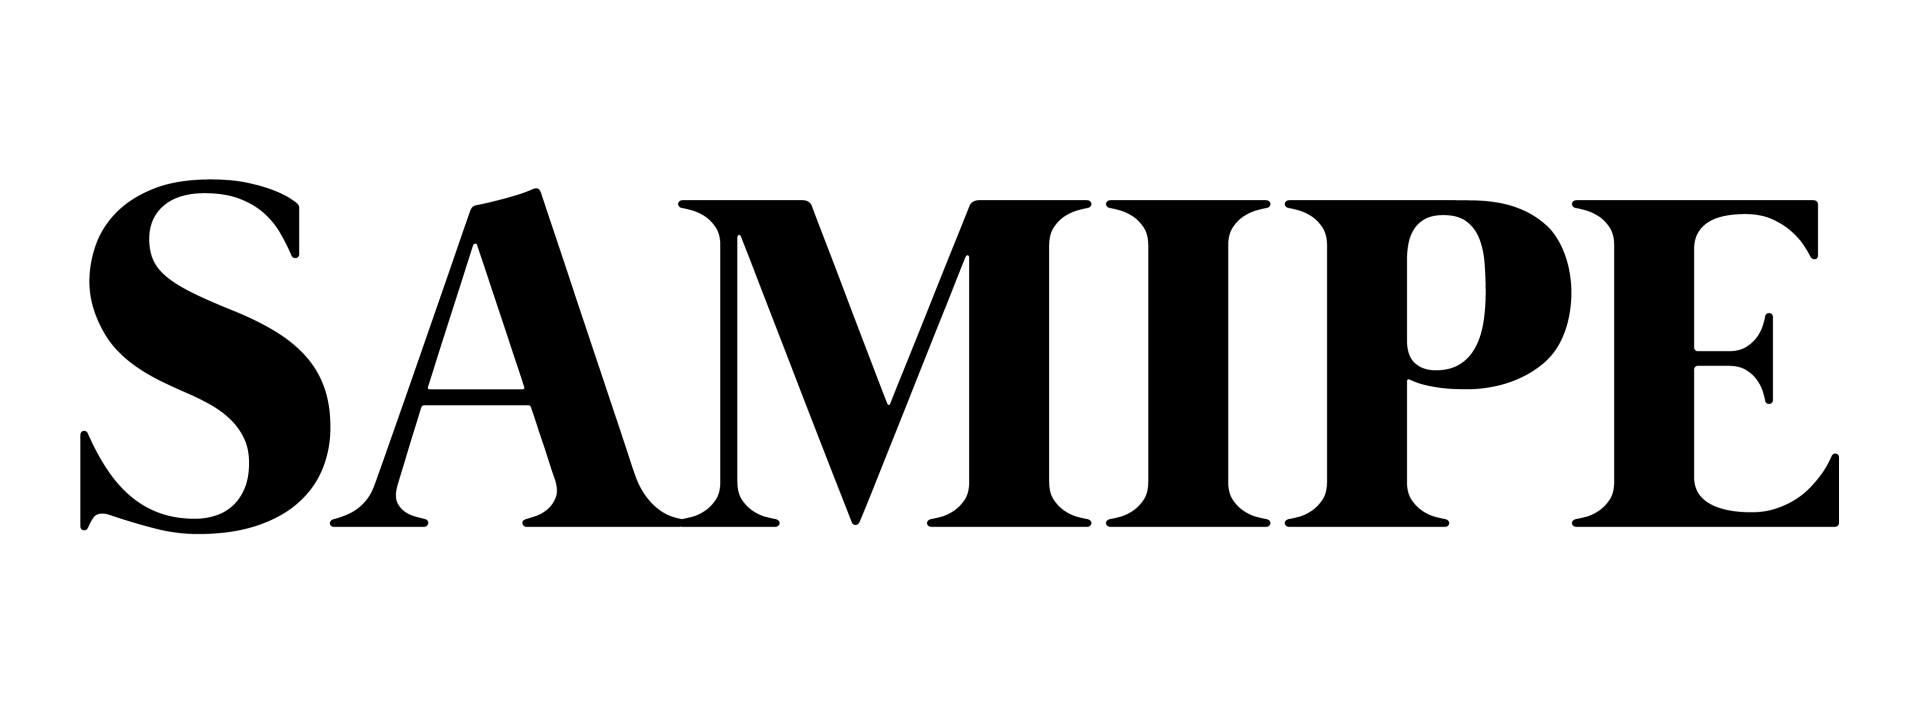 SAMIPE II, Lda